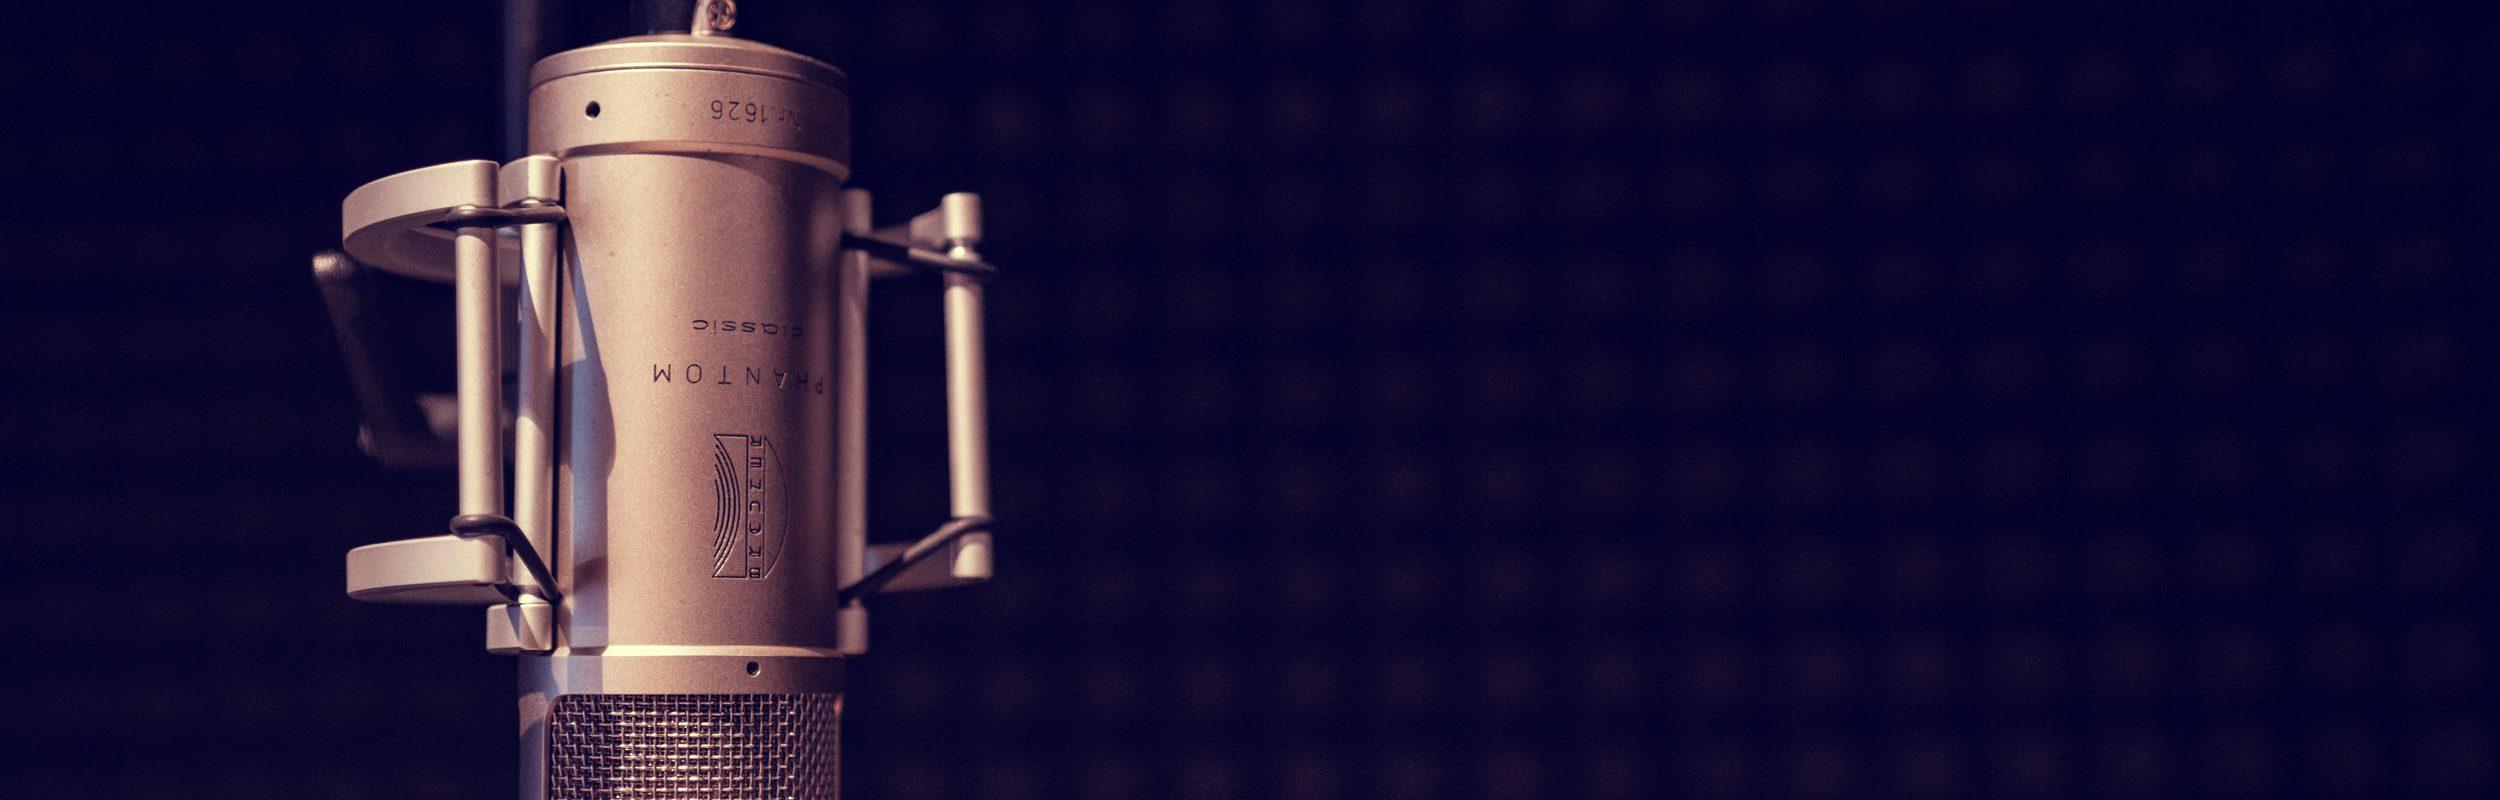 Mikrofon Brauner Aufnahmekabine